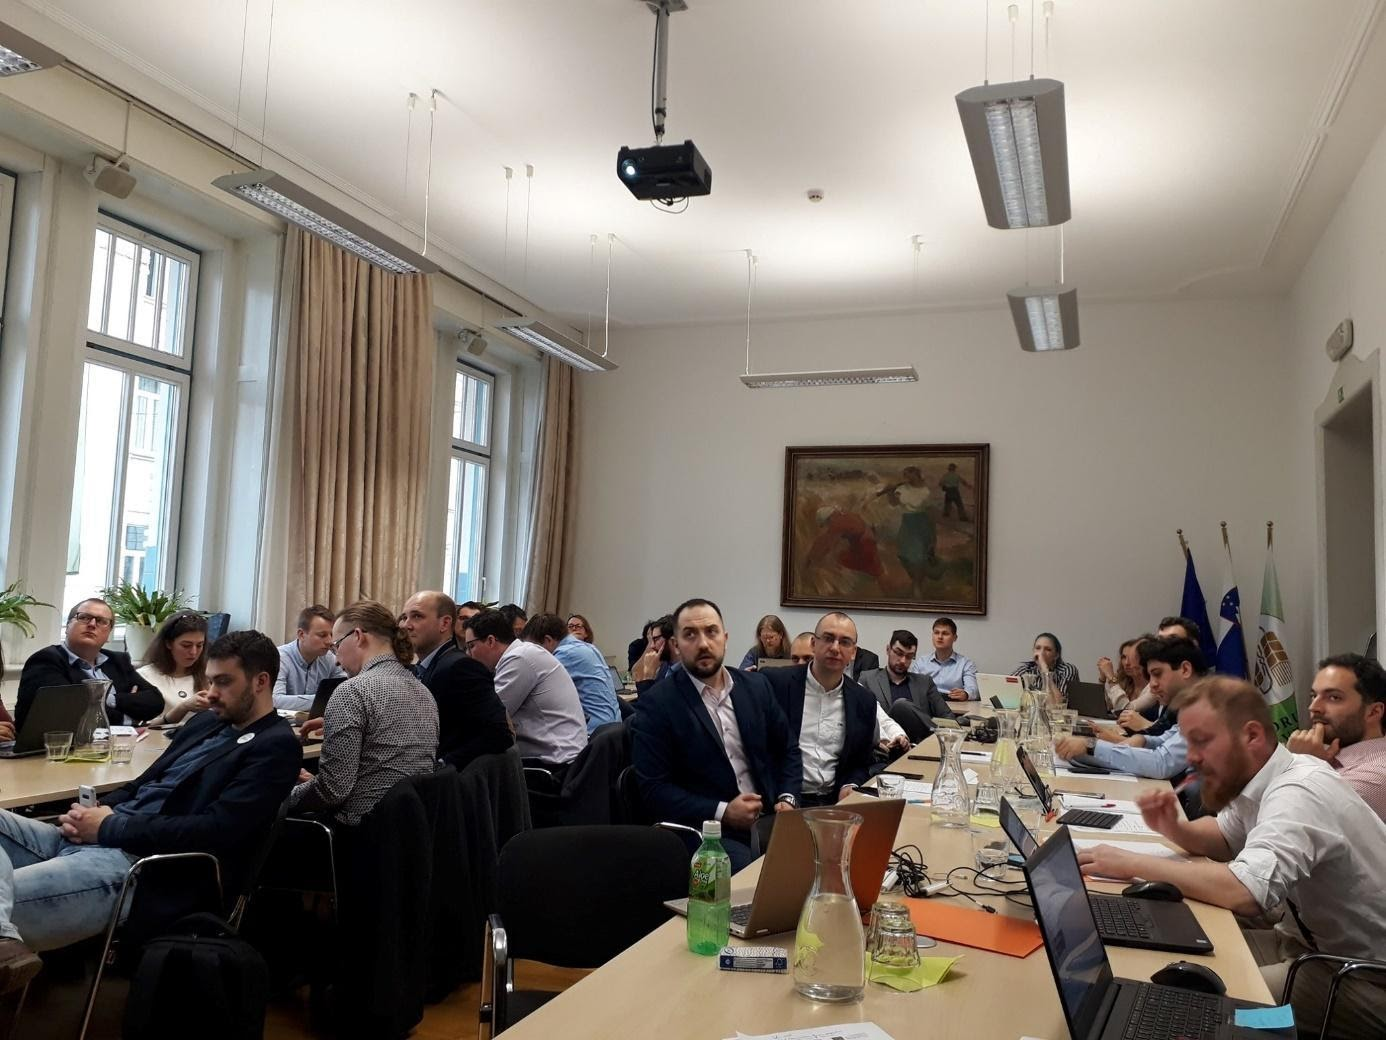 ZSPM European Council of Young Farmers